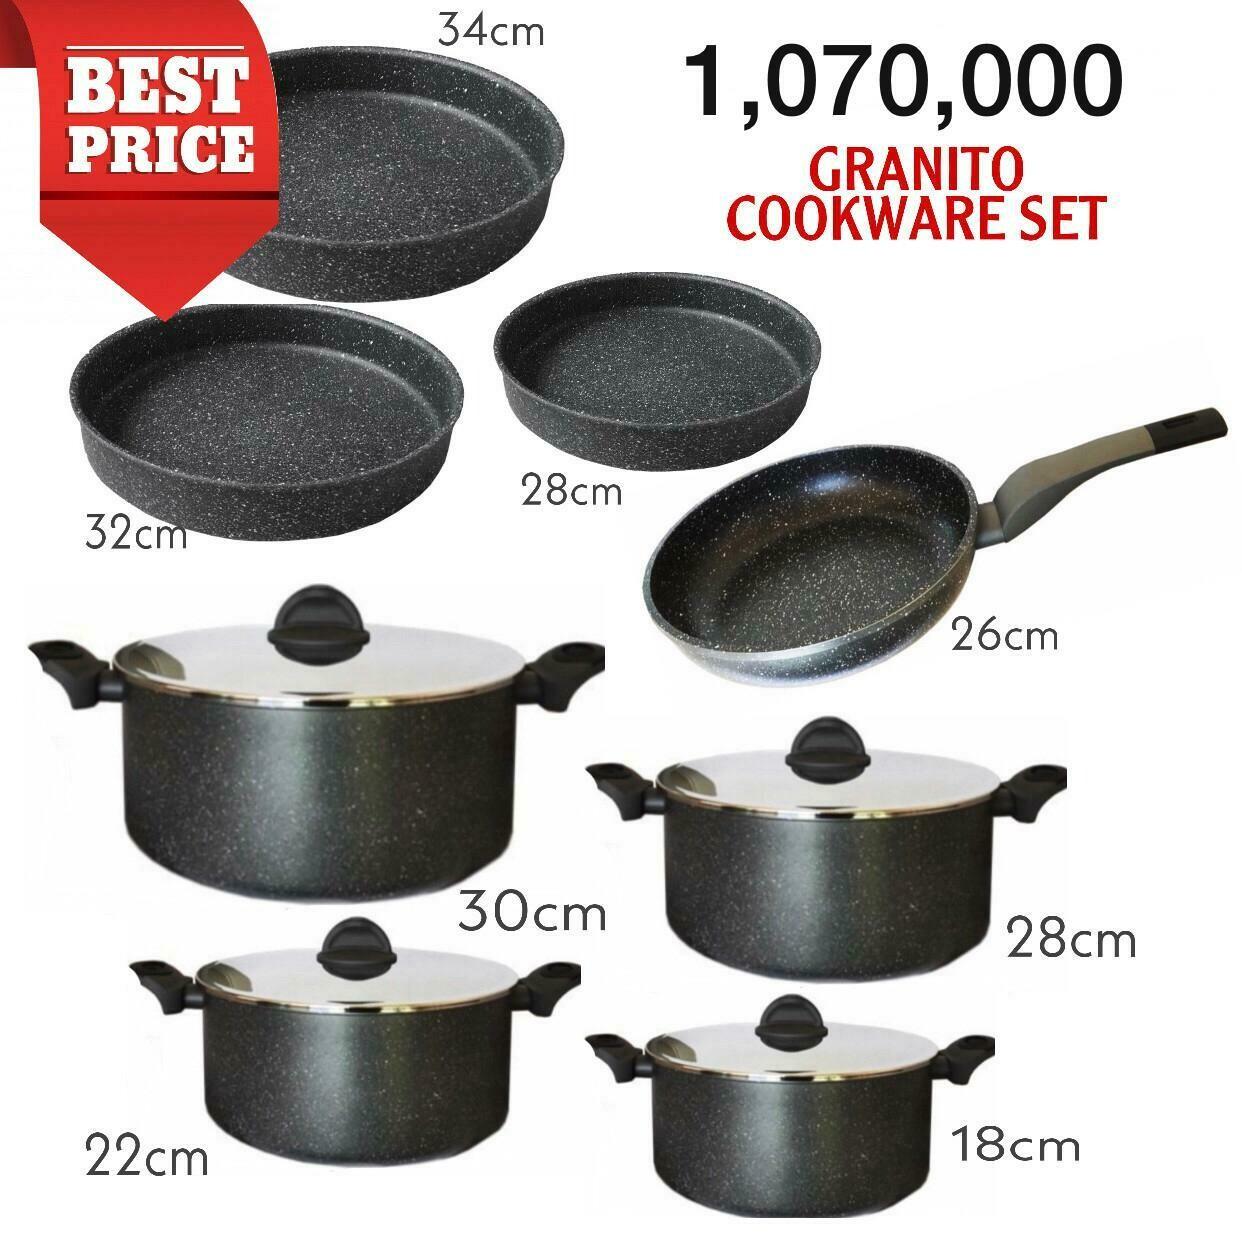 Granito Cookware Offer